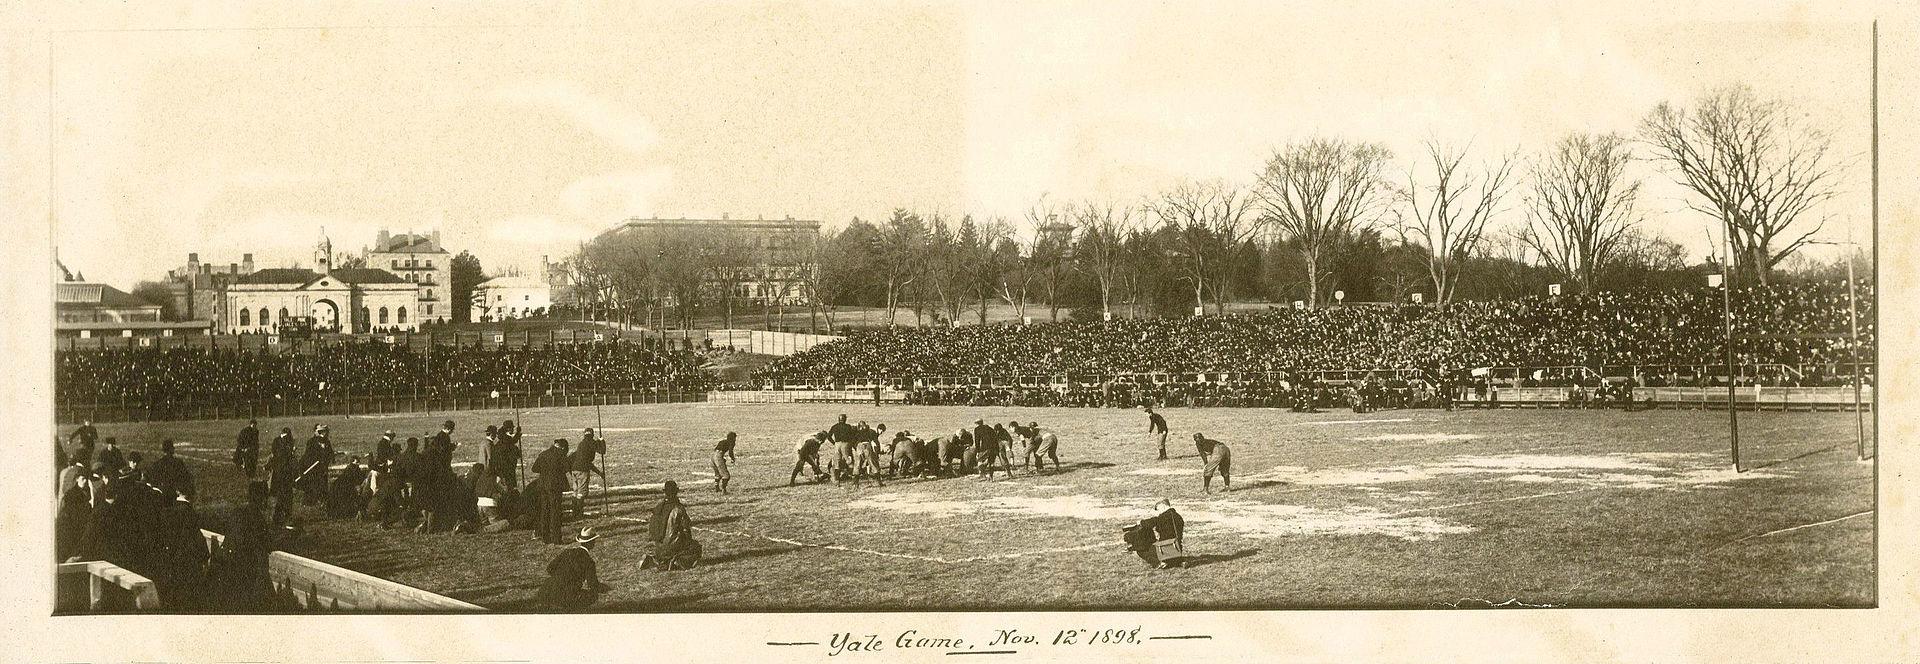 1898 college football season